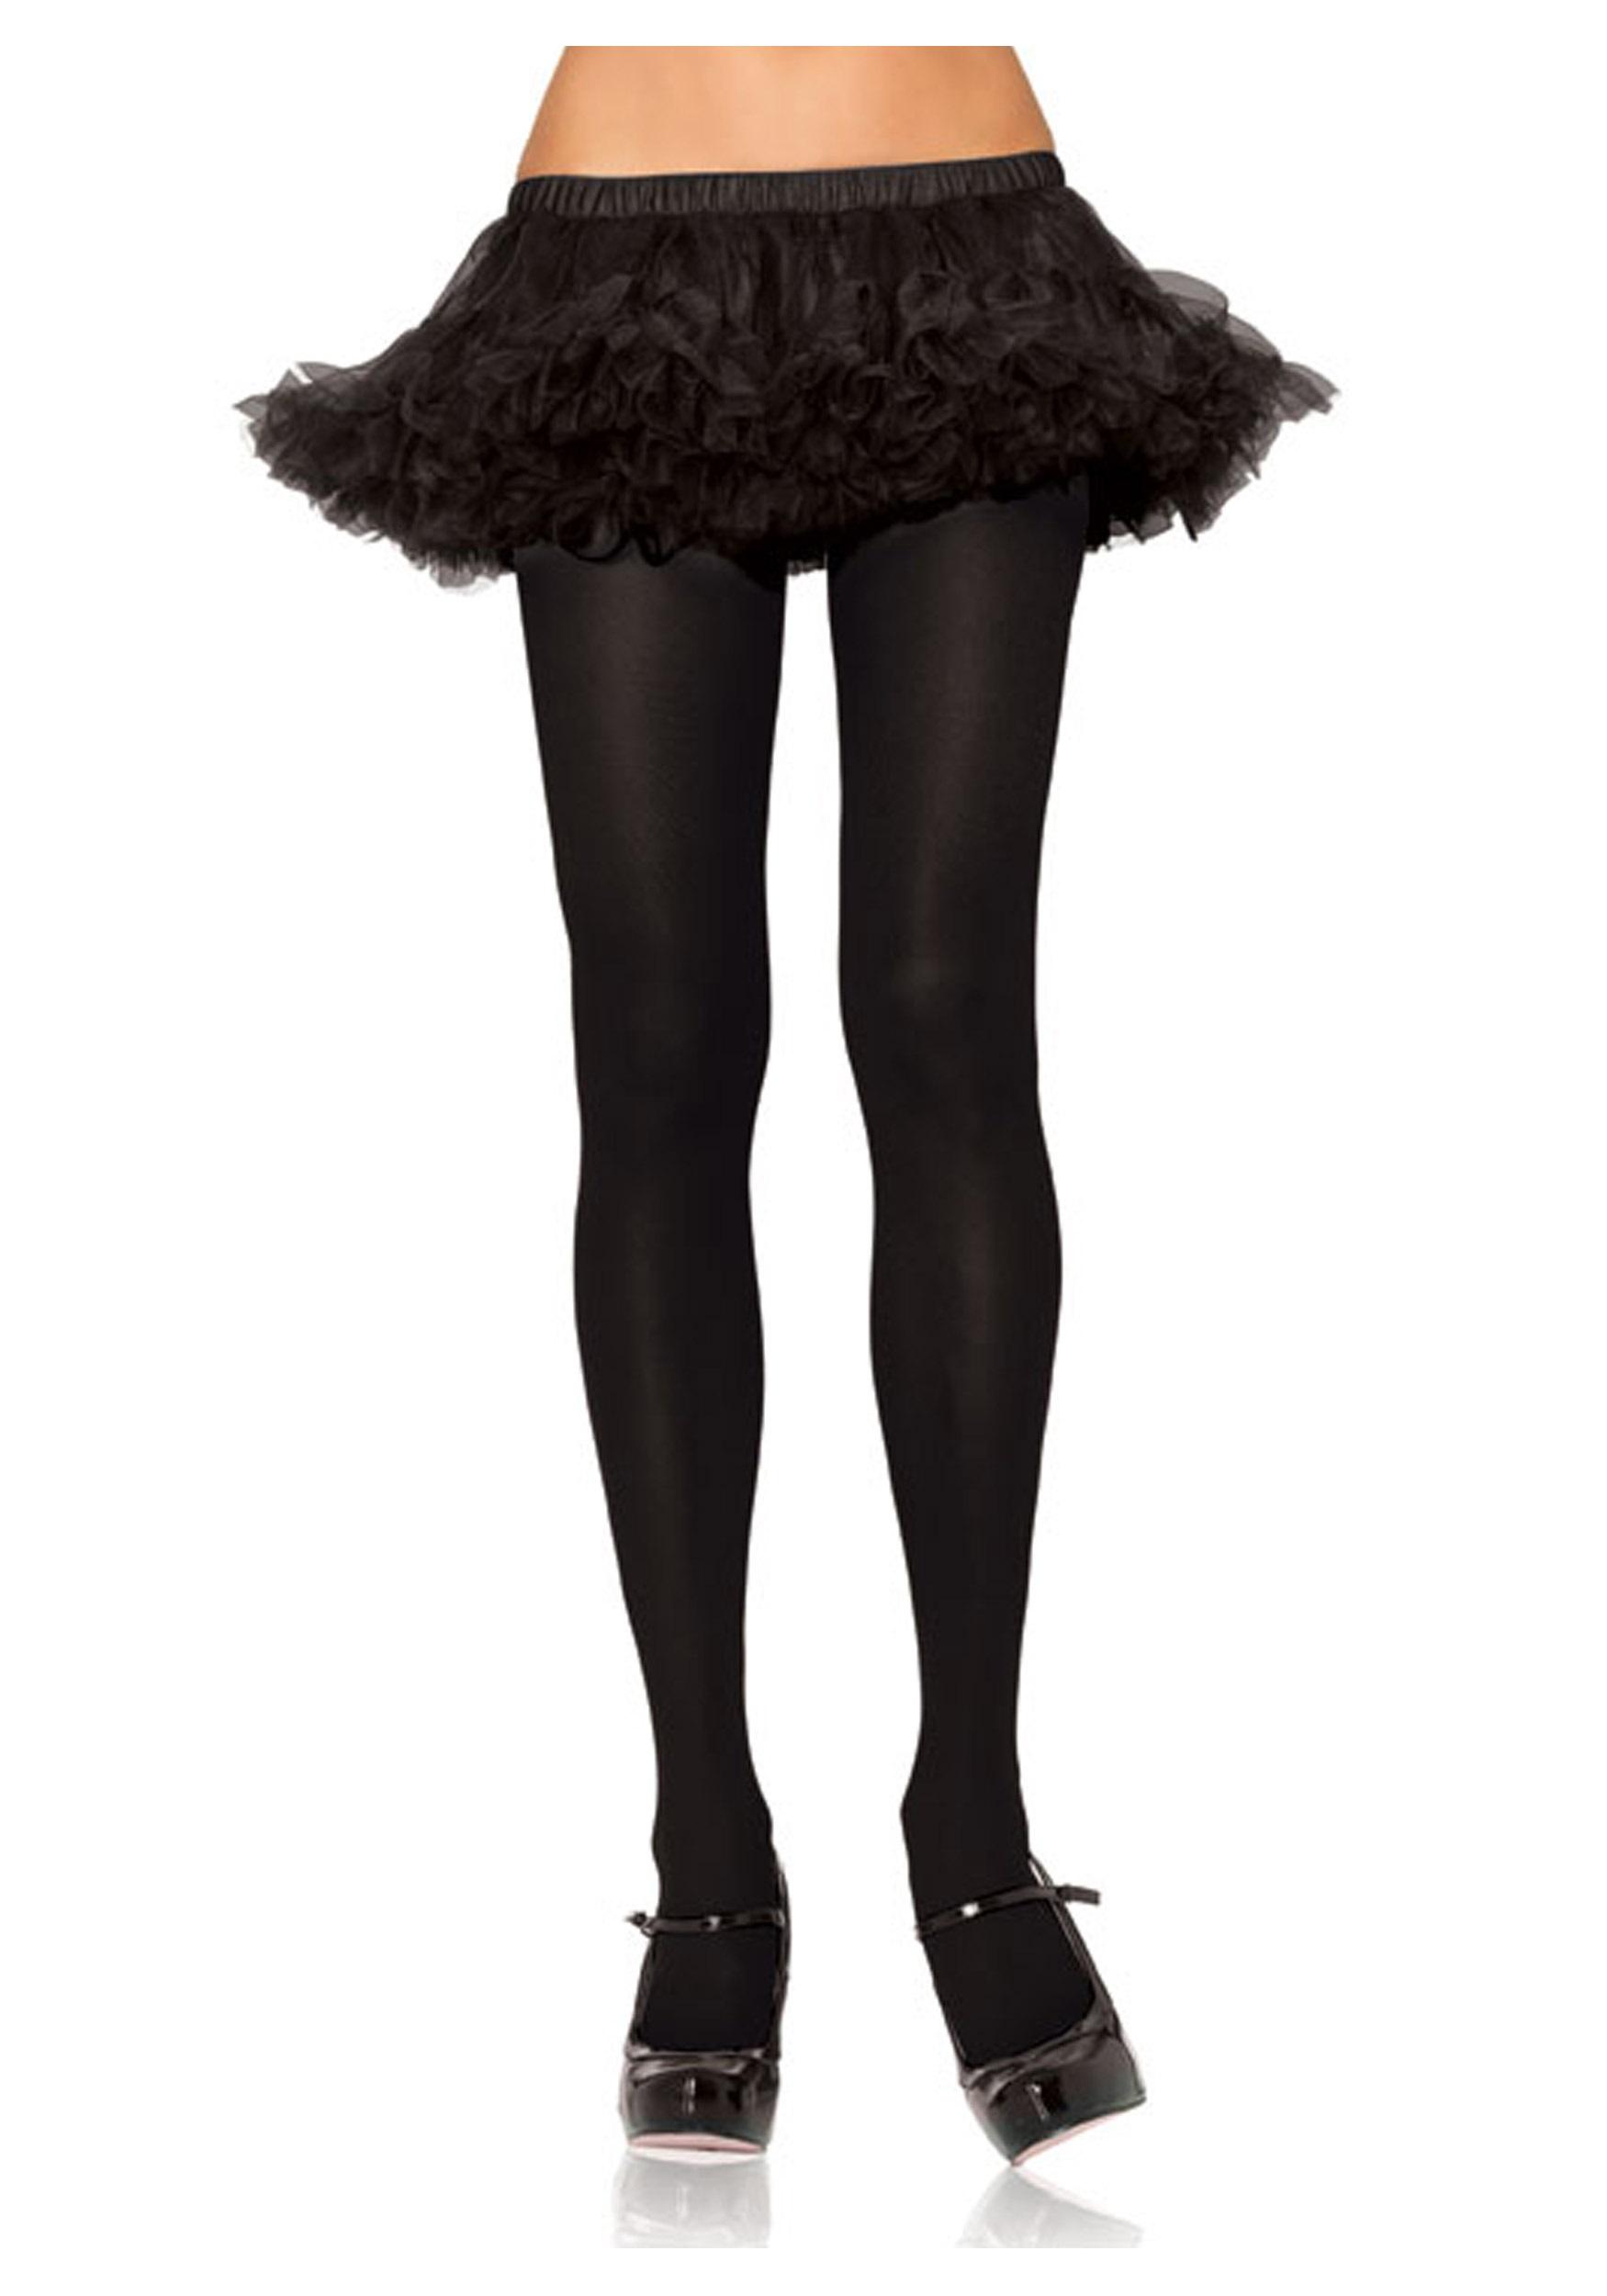 and-tights-pantyhose-tights